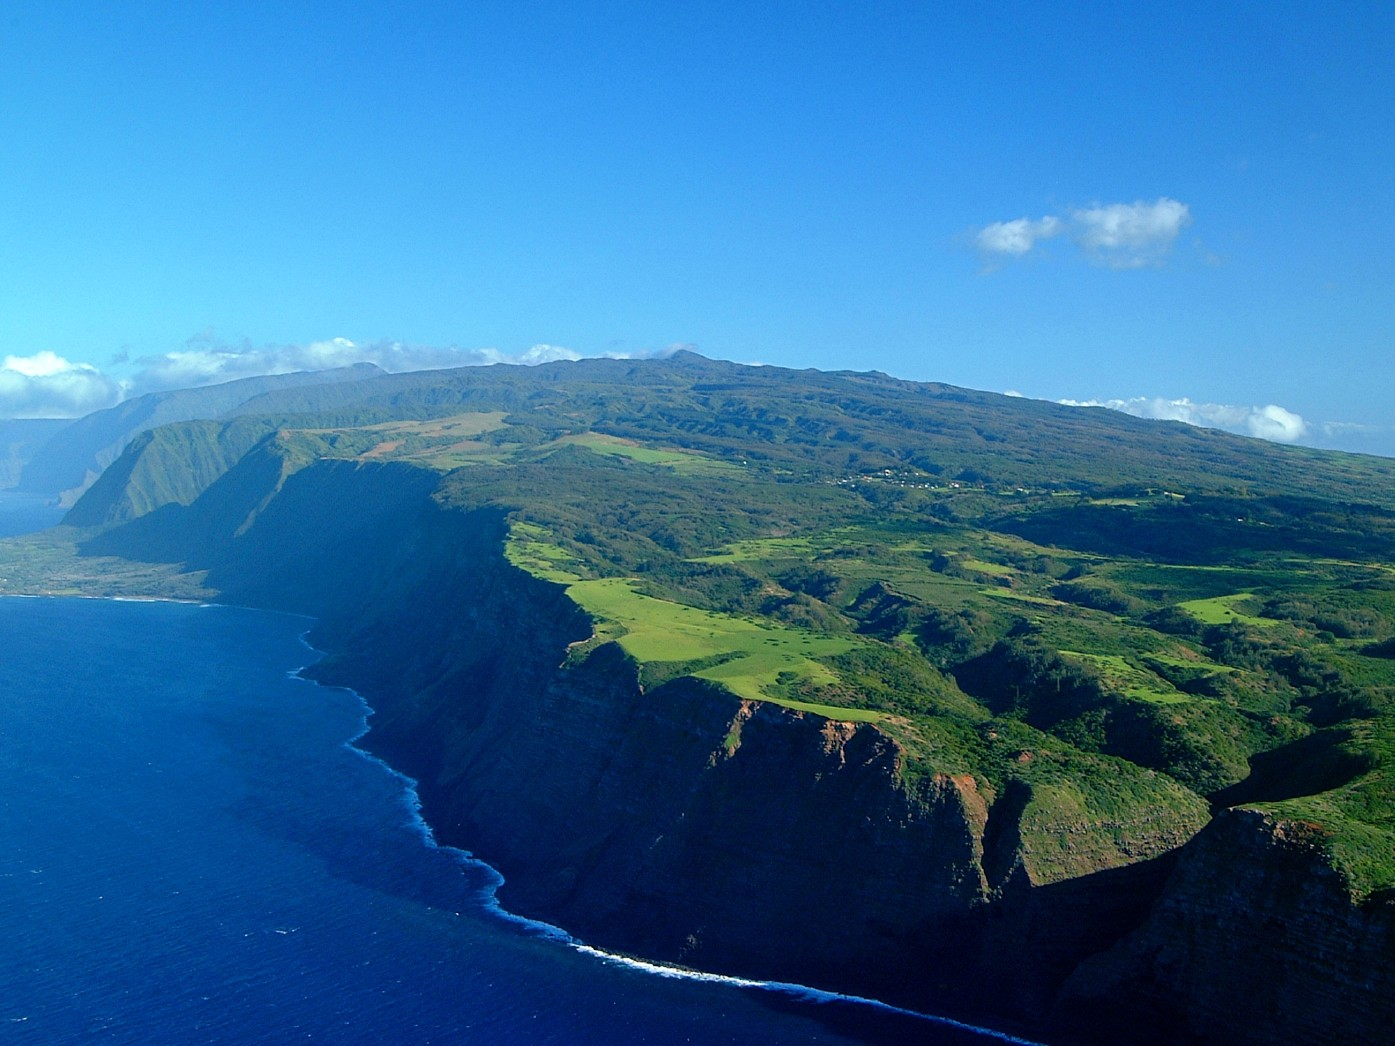 Travel Trip Journey: Hawaii-Molokai